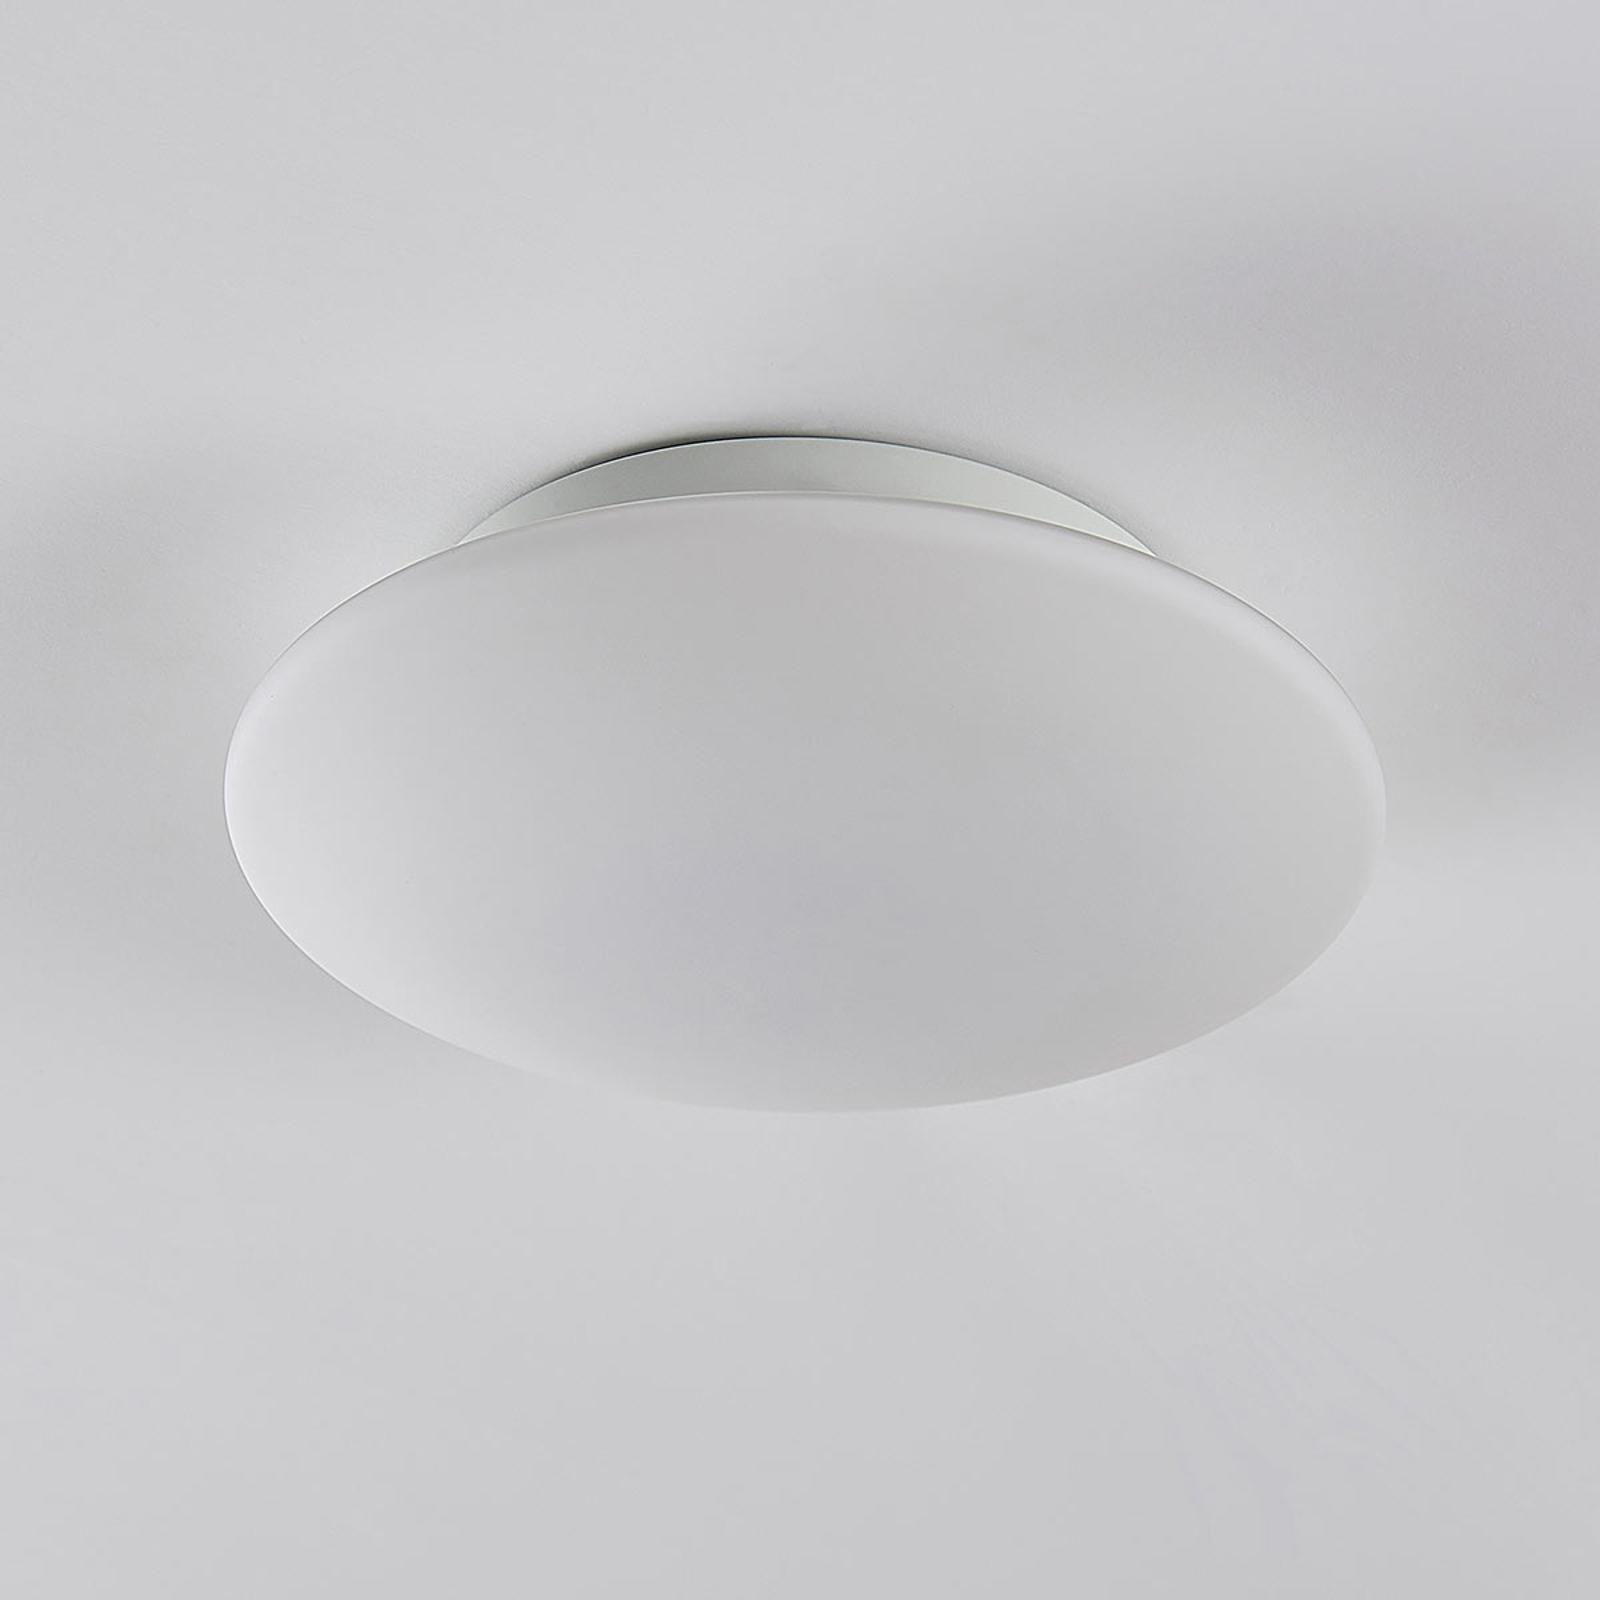 Runde Glas LED Deckenleuchte Toan, IP20 dimmbar